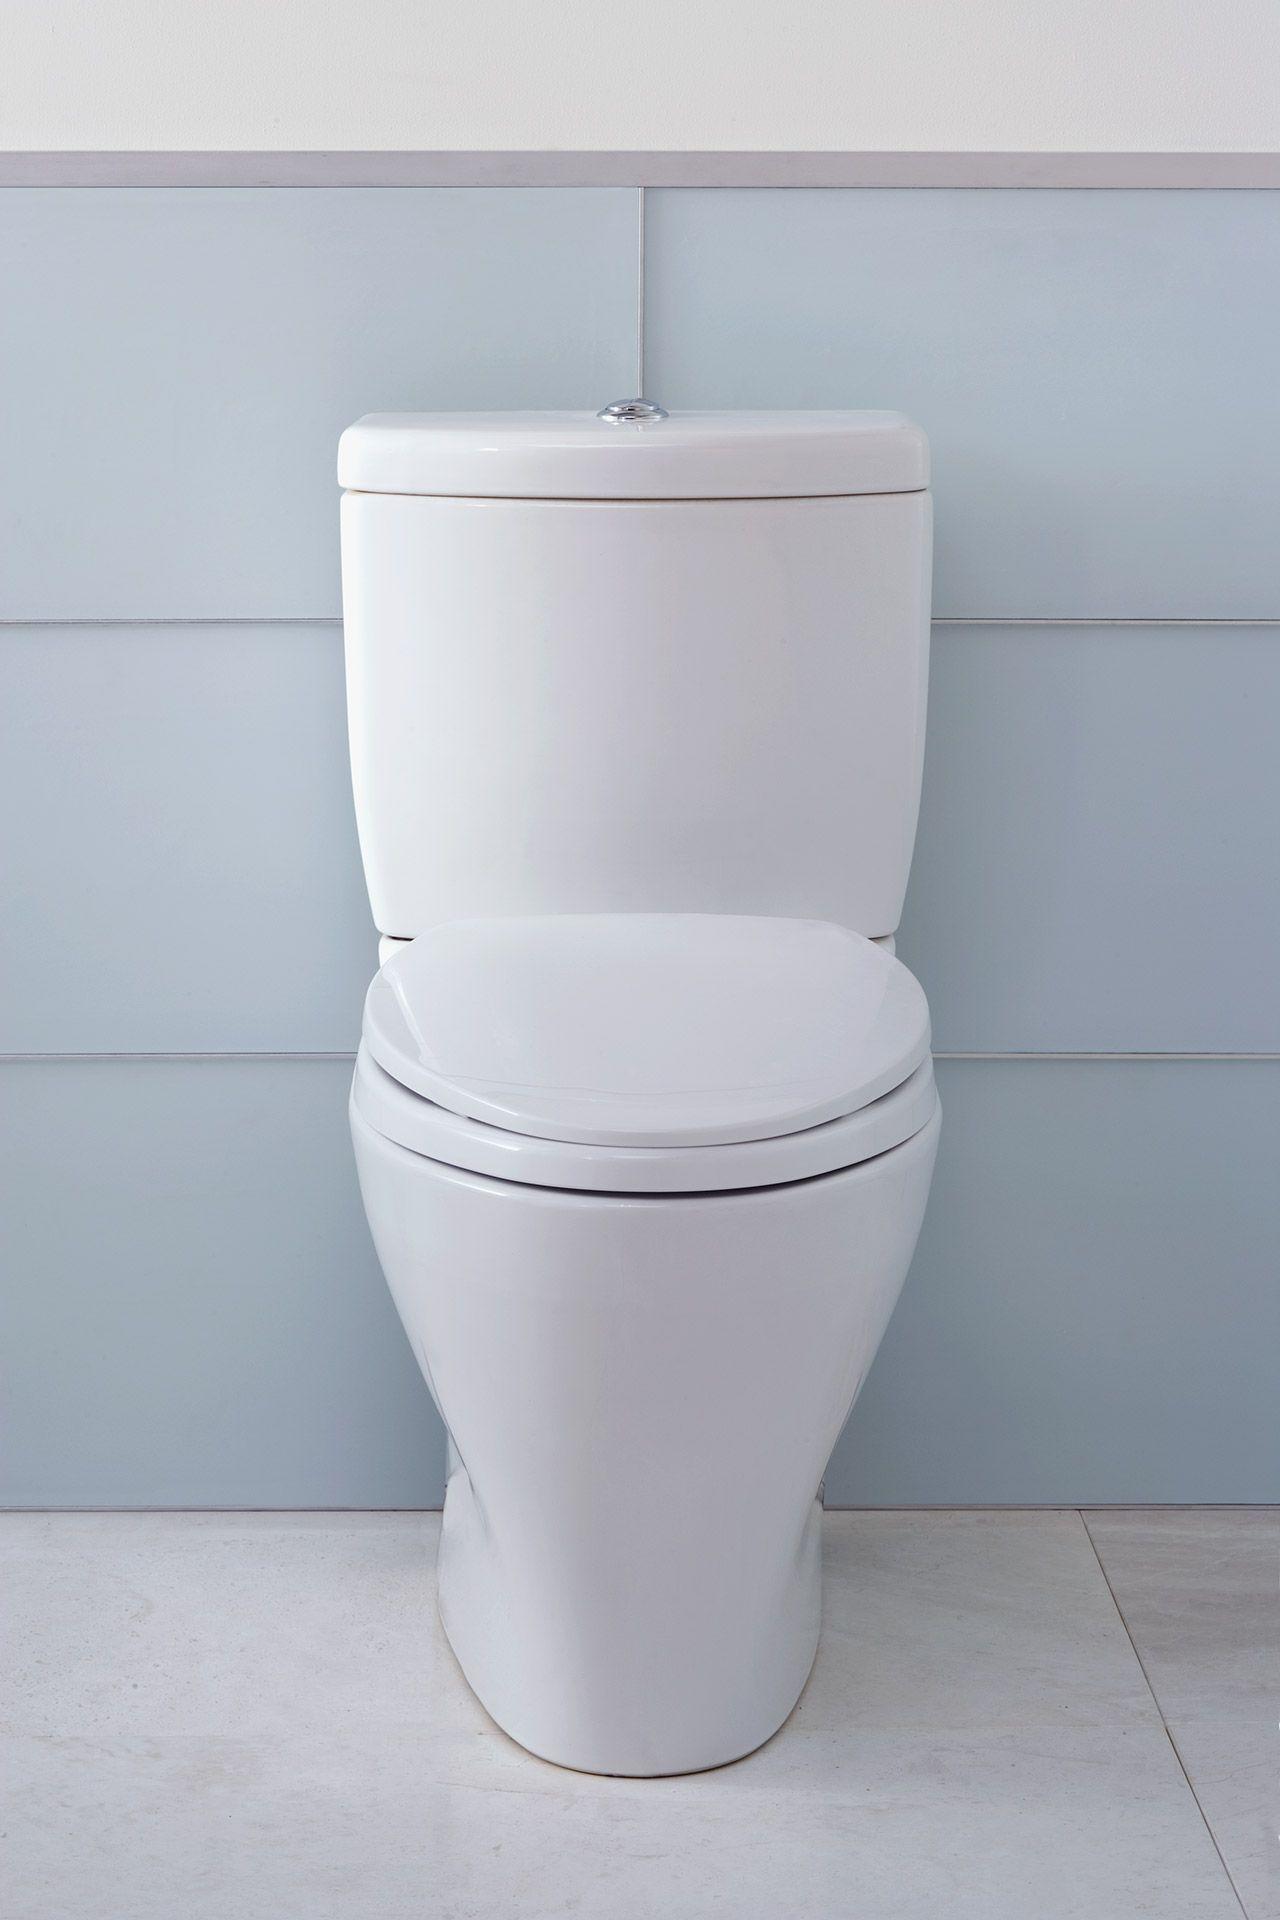 Aquia 174 Dual Flush Two Piece Toilet 1 6gpf Amp 0 9gpf 10